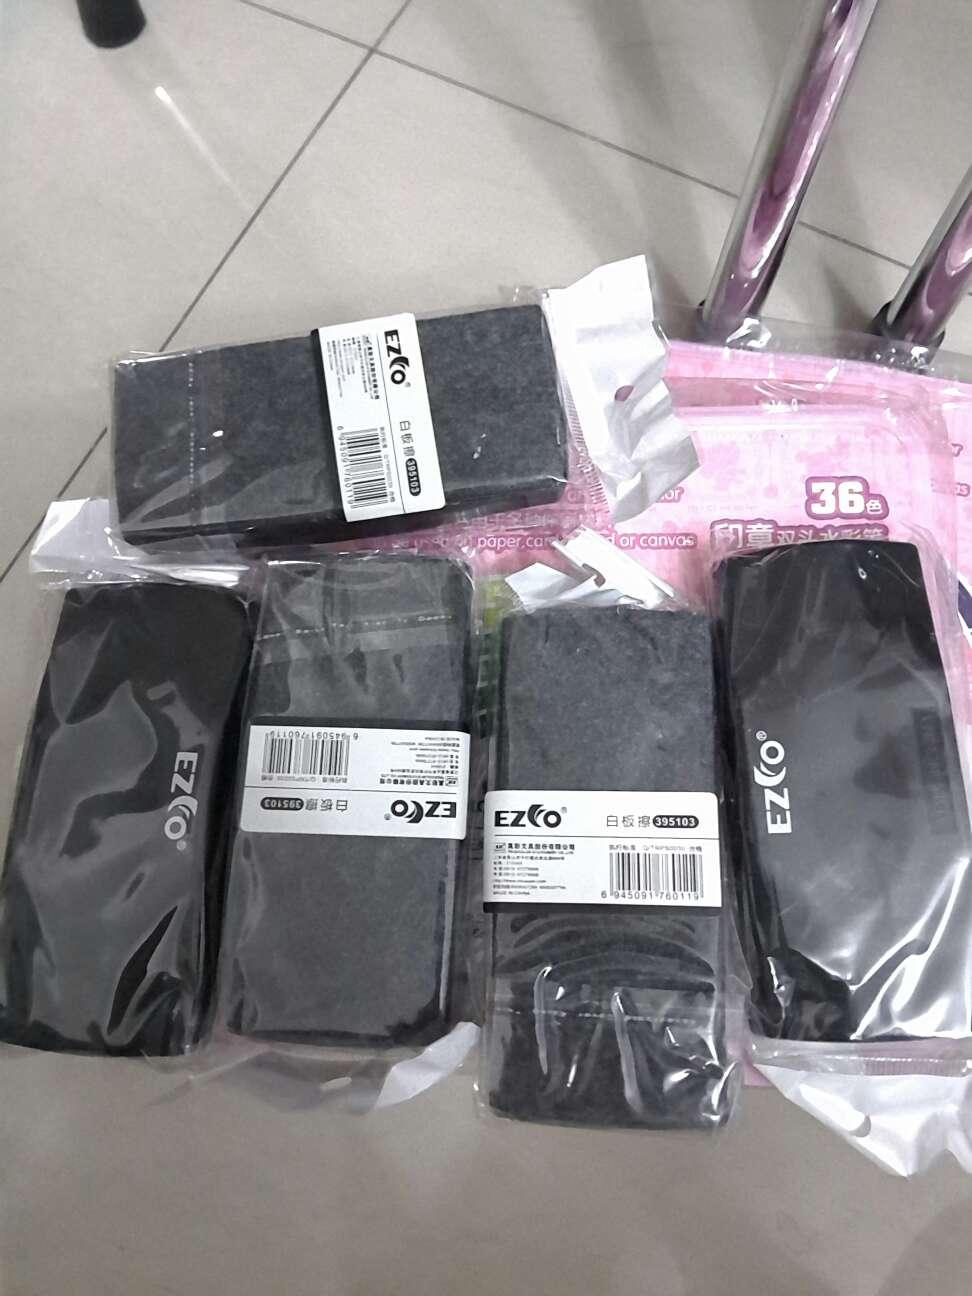 custom elite socks 2.0 00230946 clearance